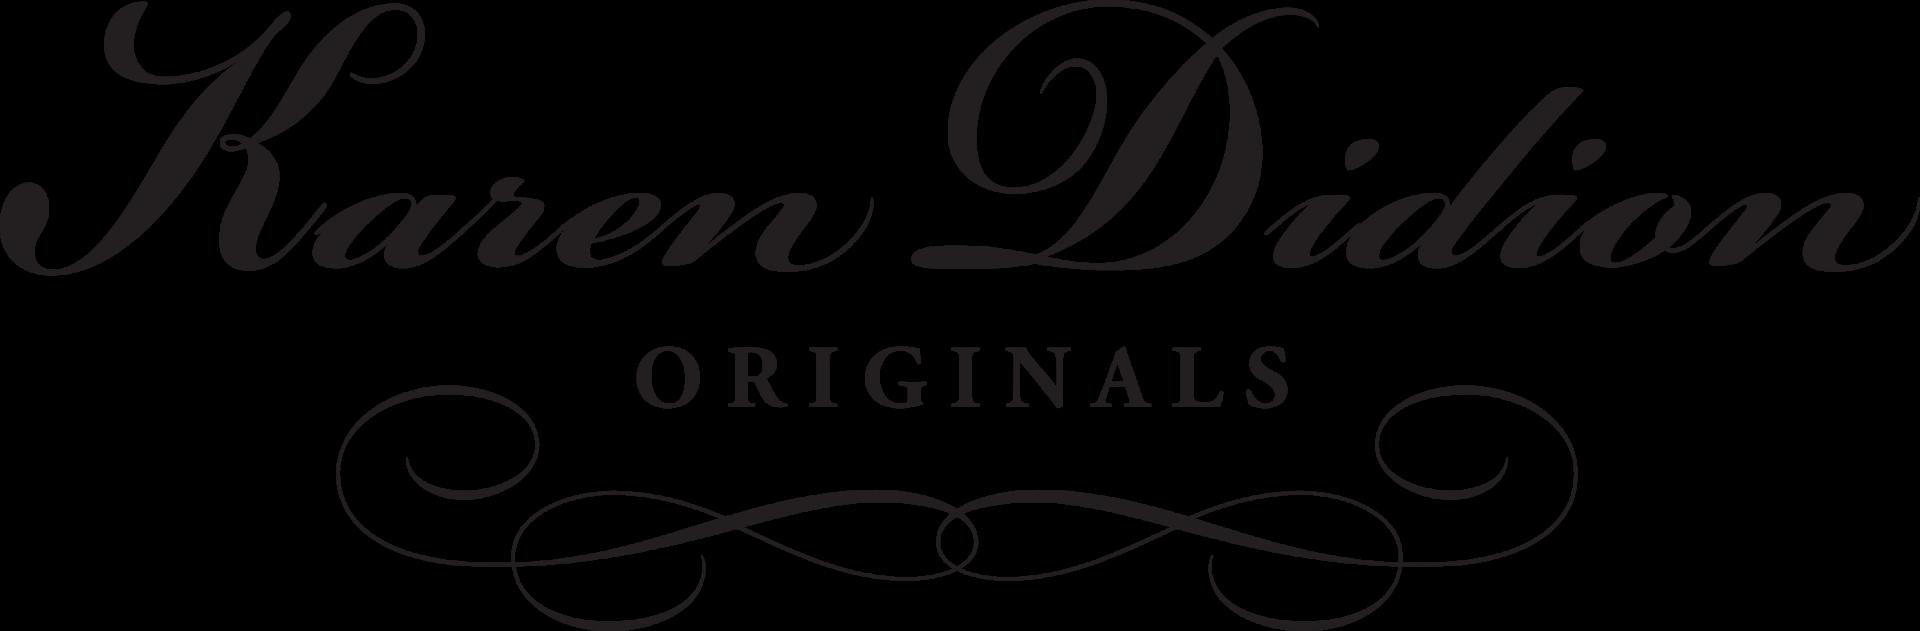 Karen Didion Logo